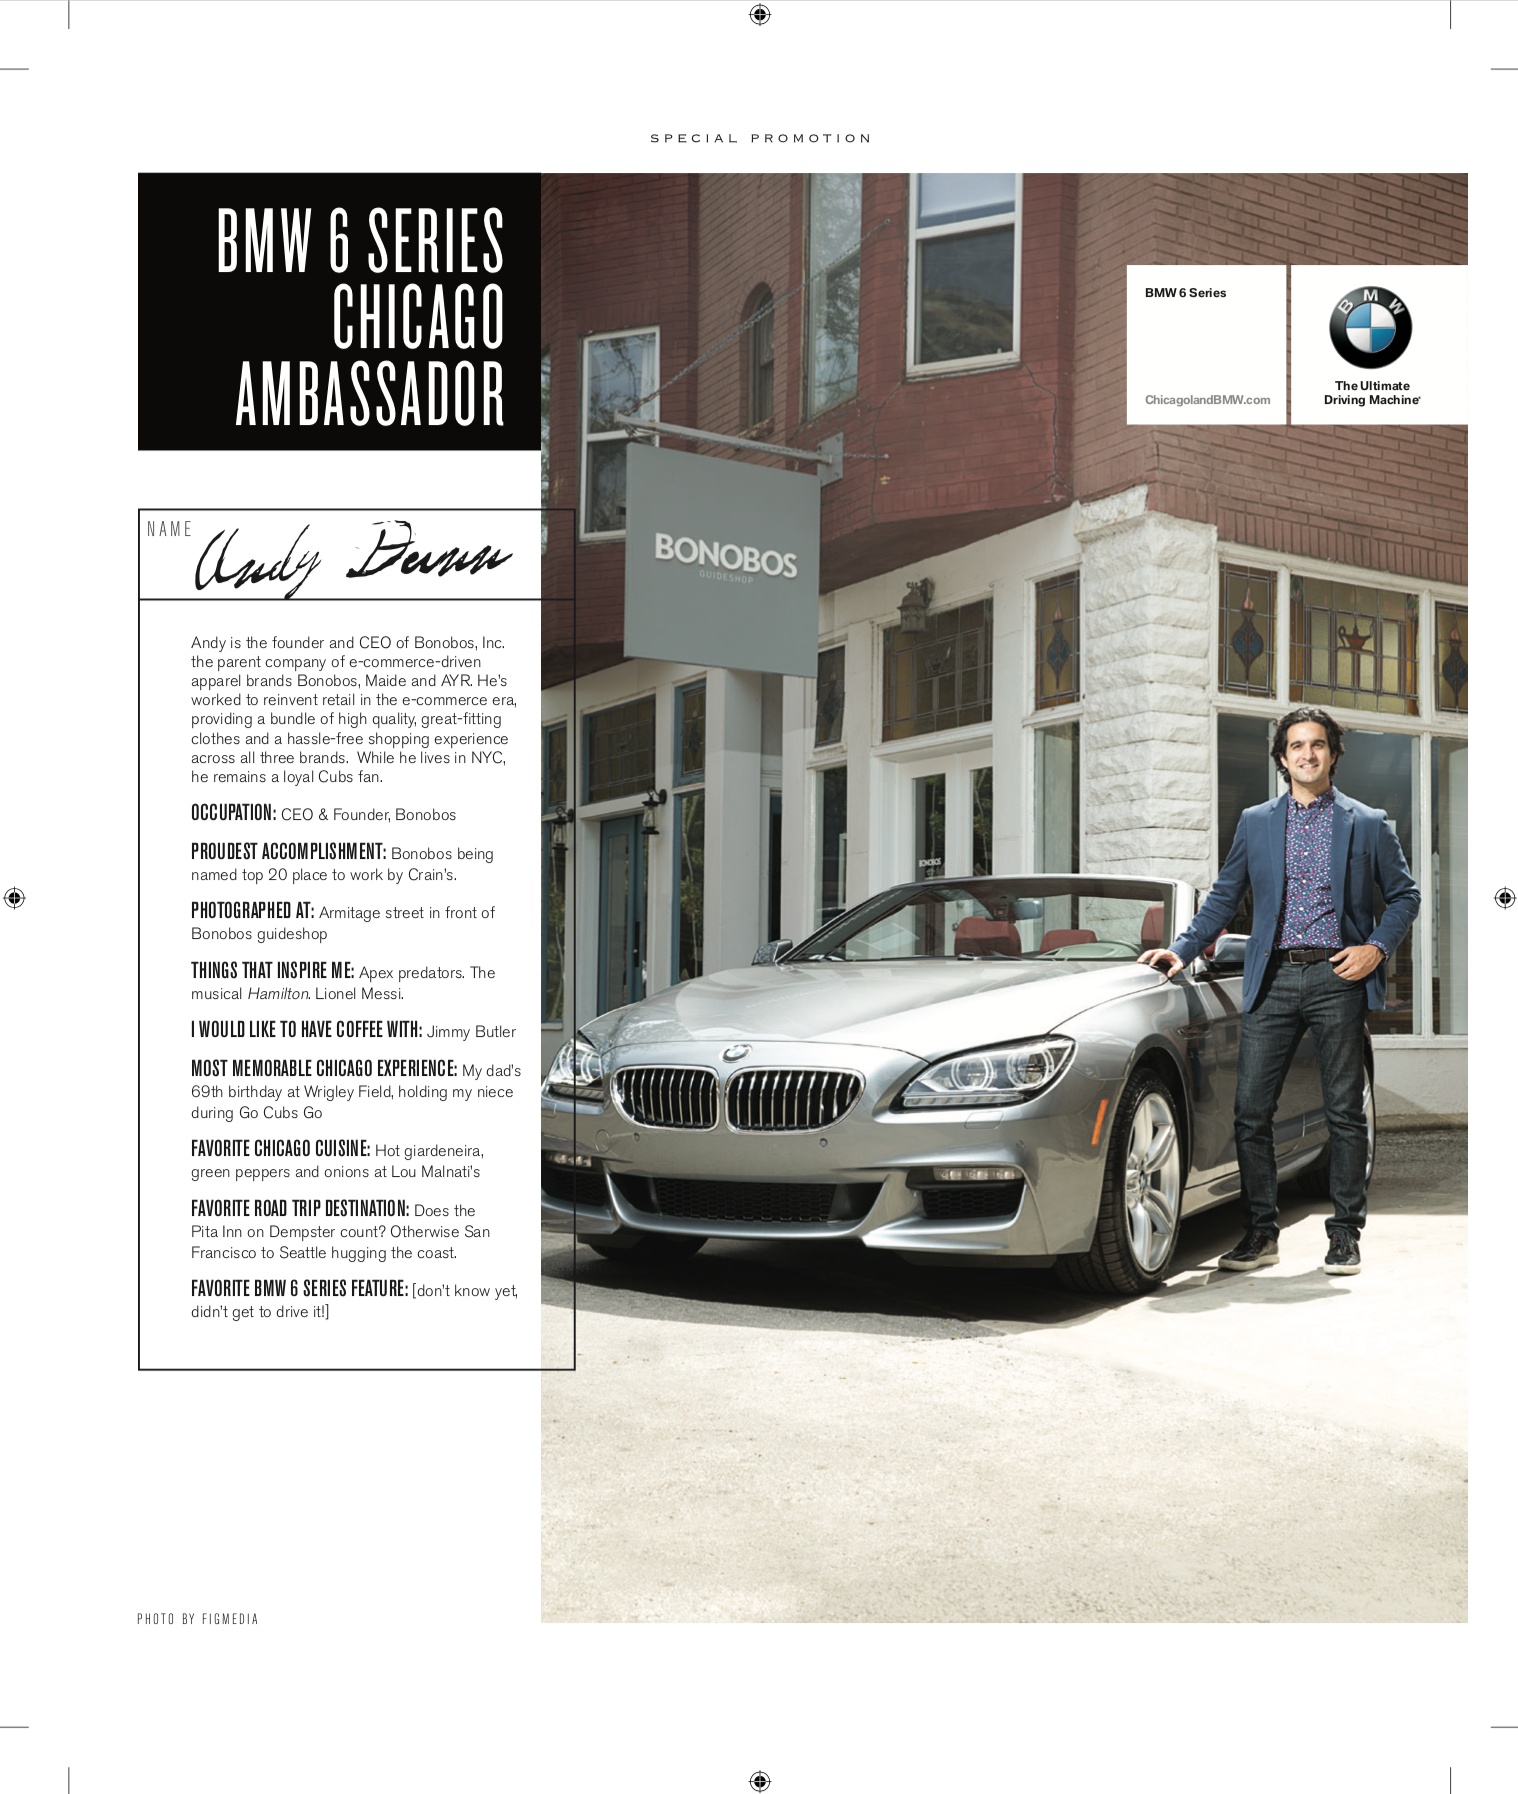 BMW-Chicago-Ambassador.jpg